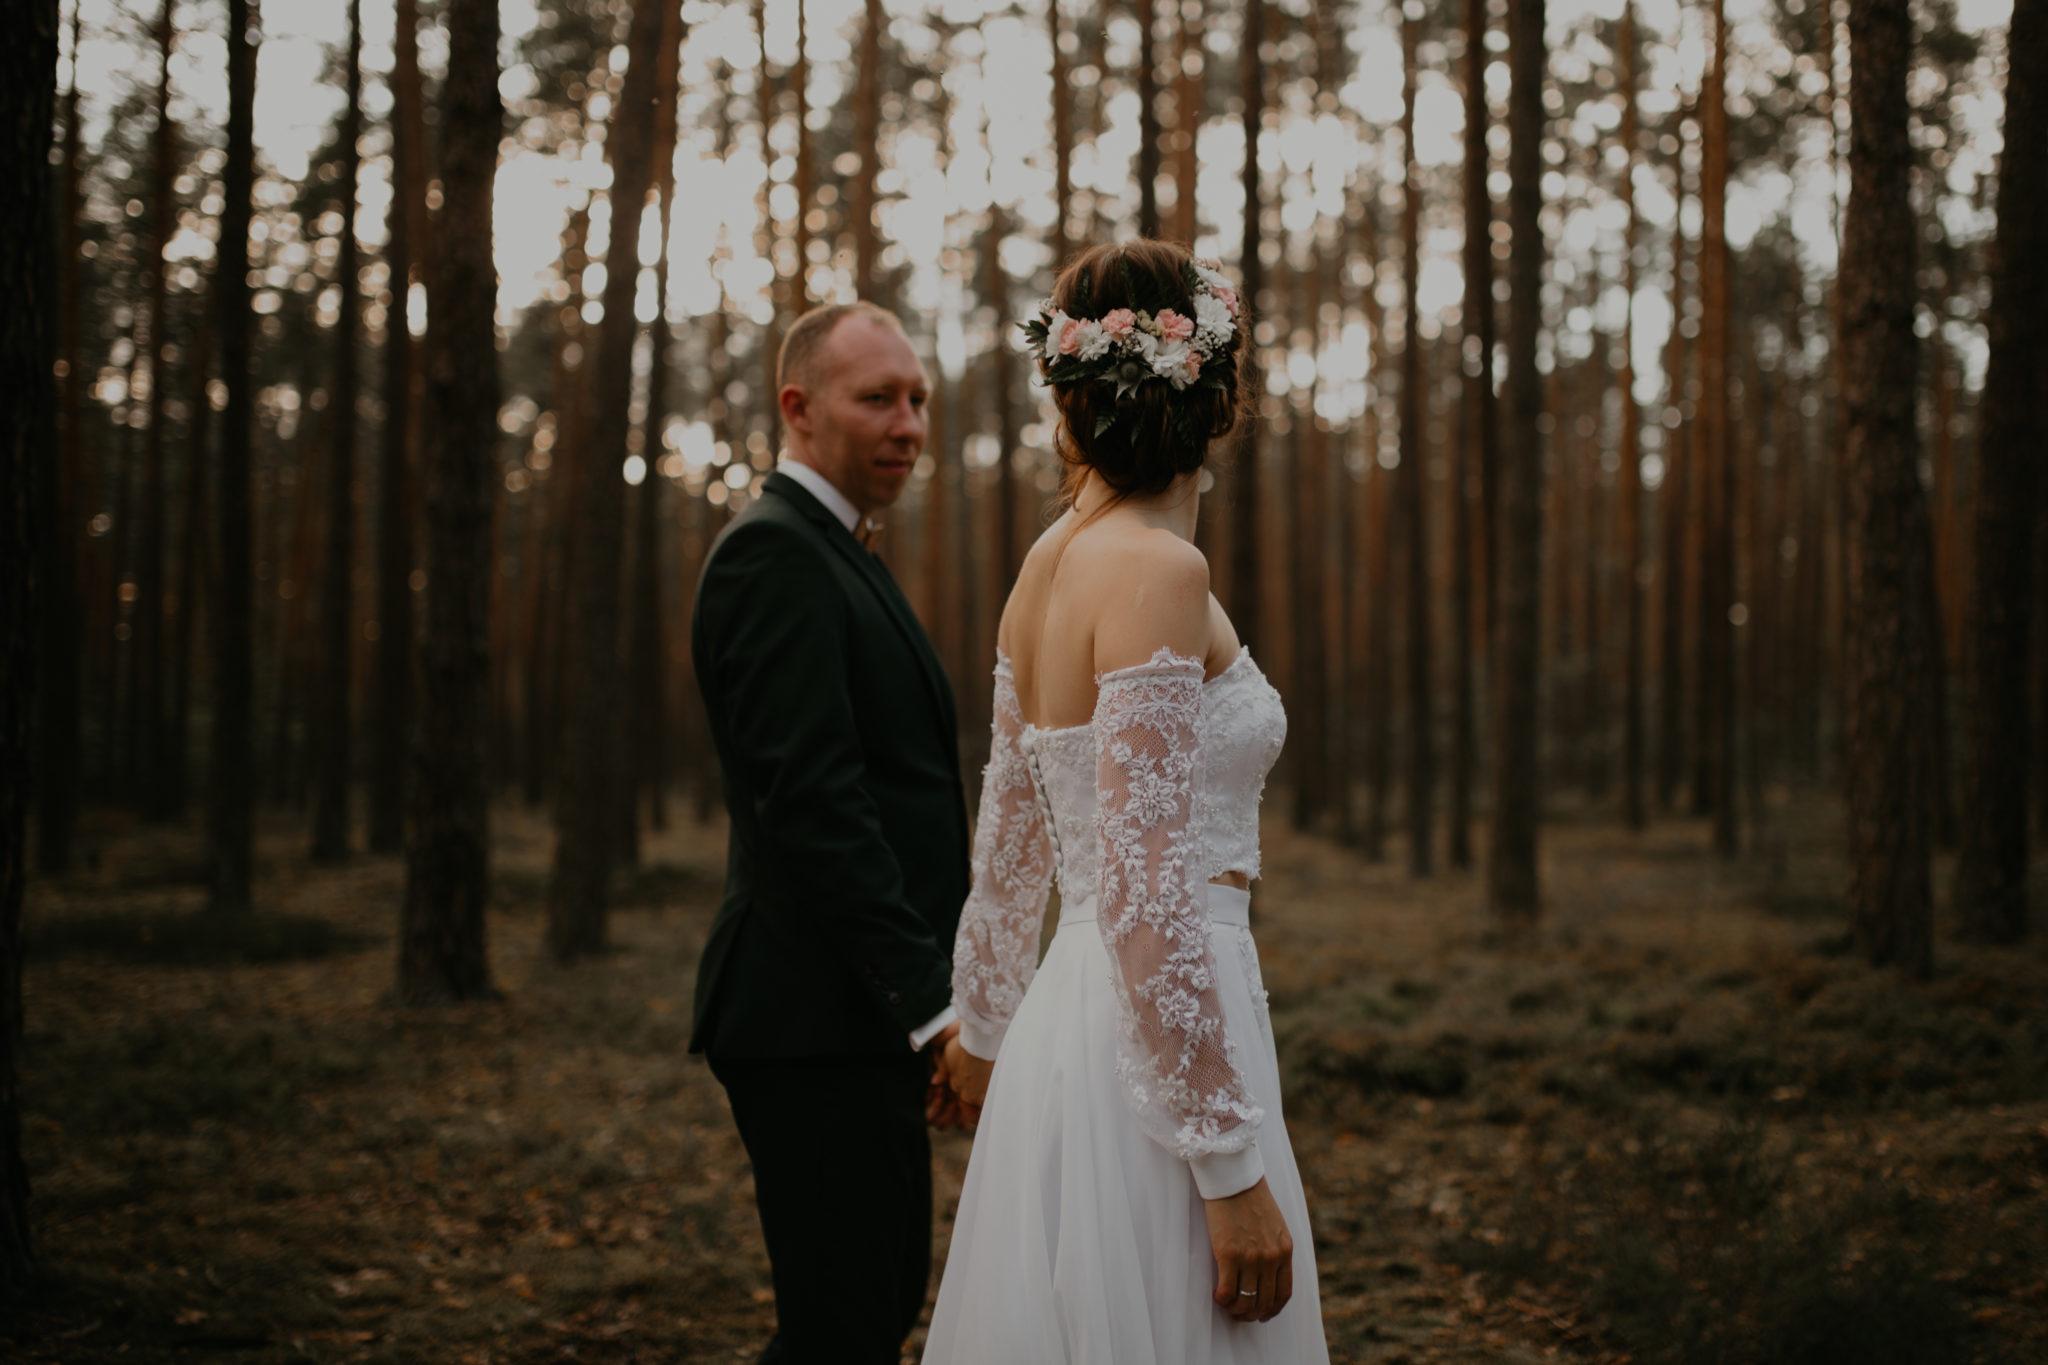 gosia i kubaplener 10 1 - fotografiagk Fotografia ślubna RK wedding